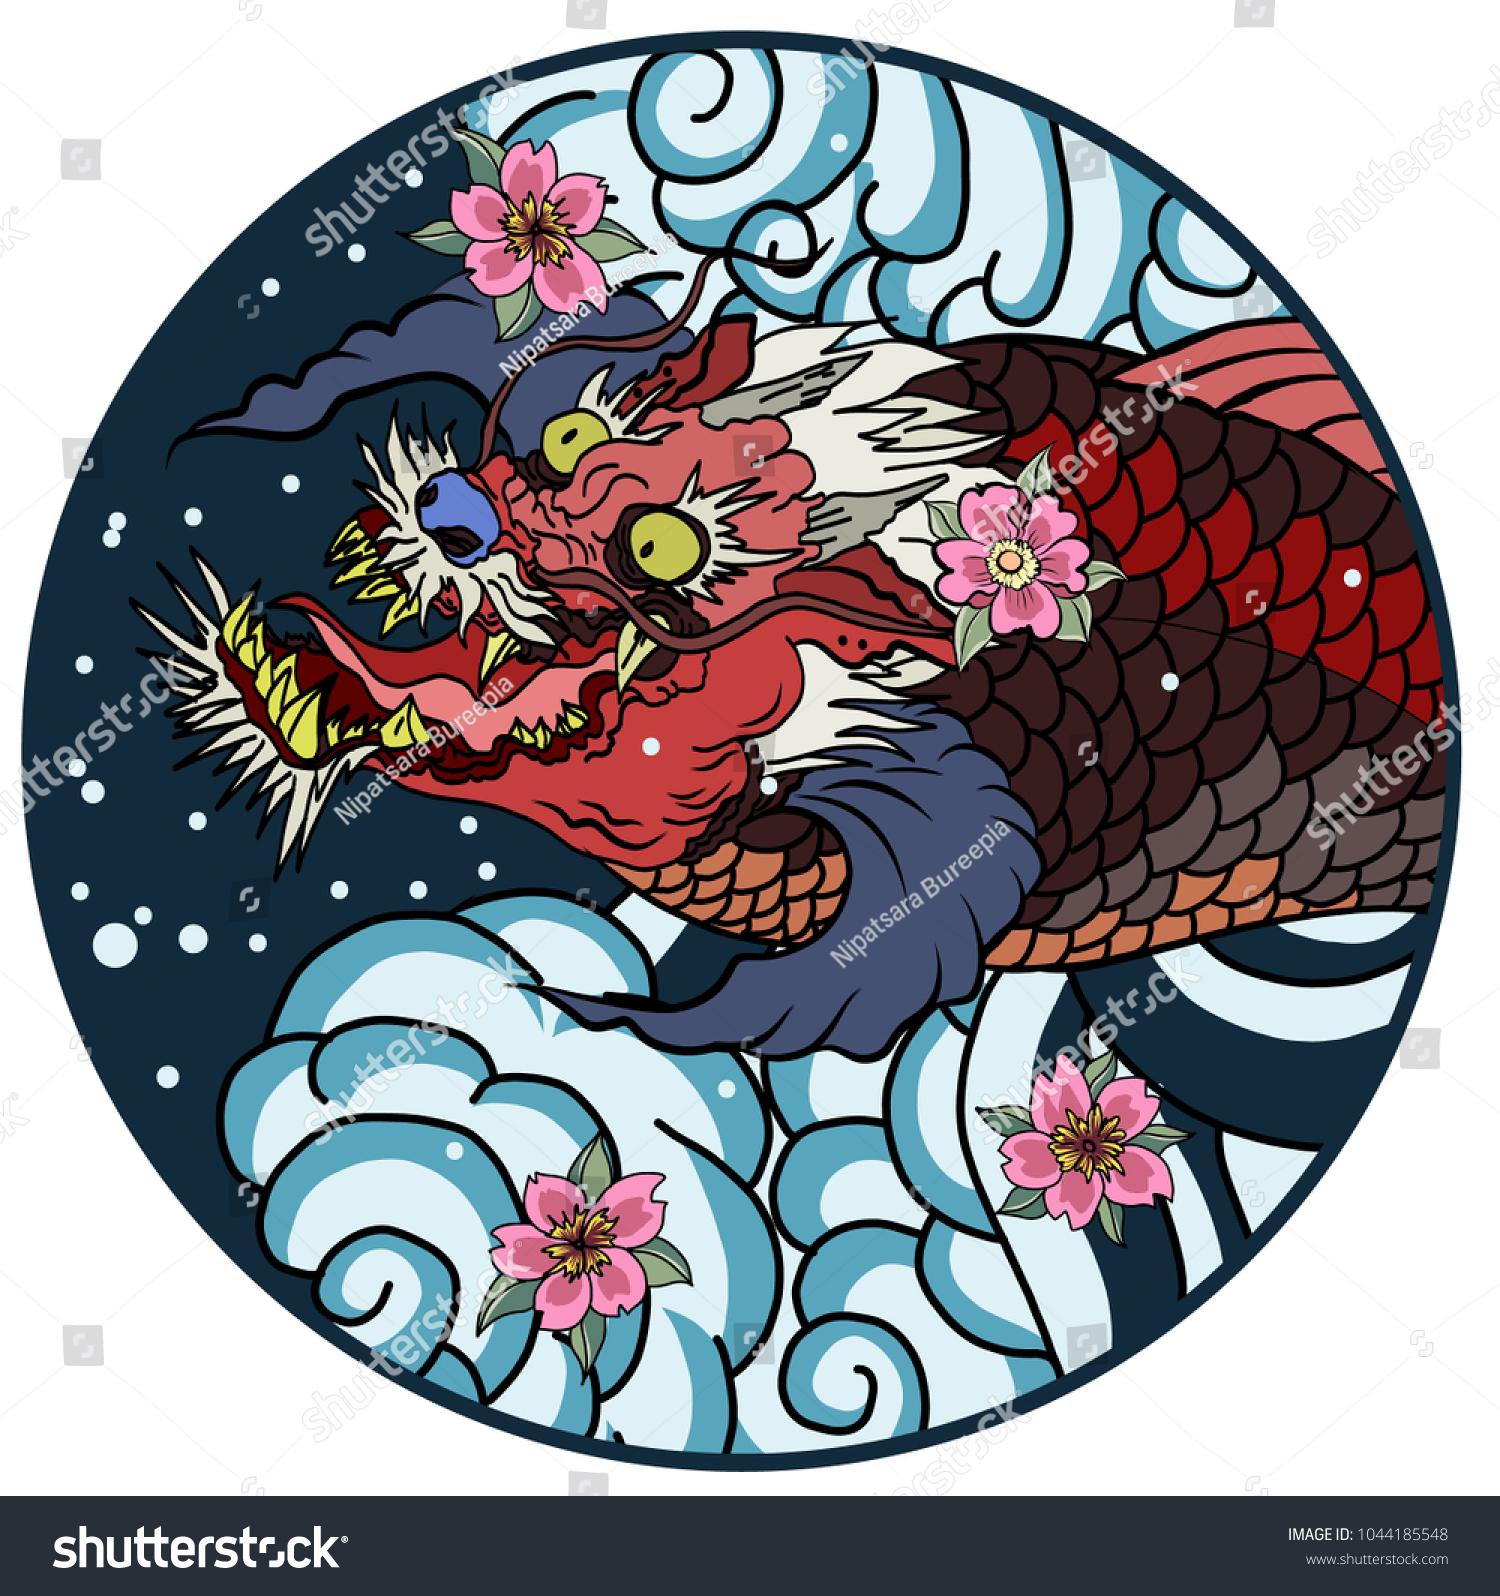 Tattoo Design Koi Dragon Cherry Blossom Stock Vector 1044185548 ...